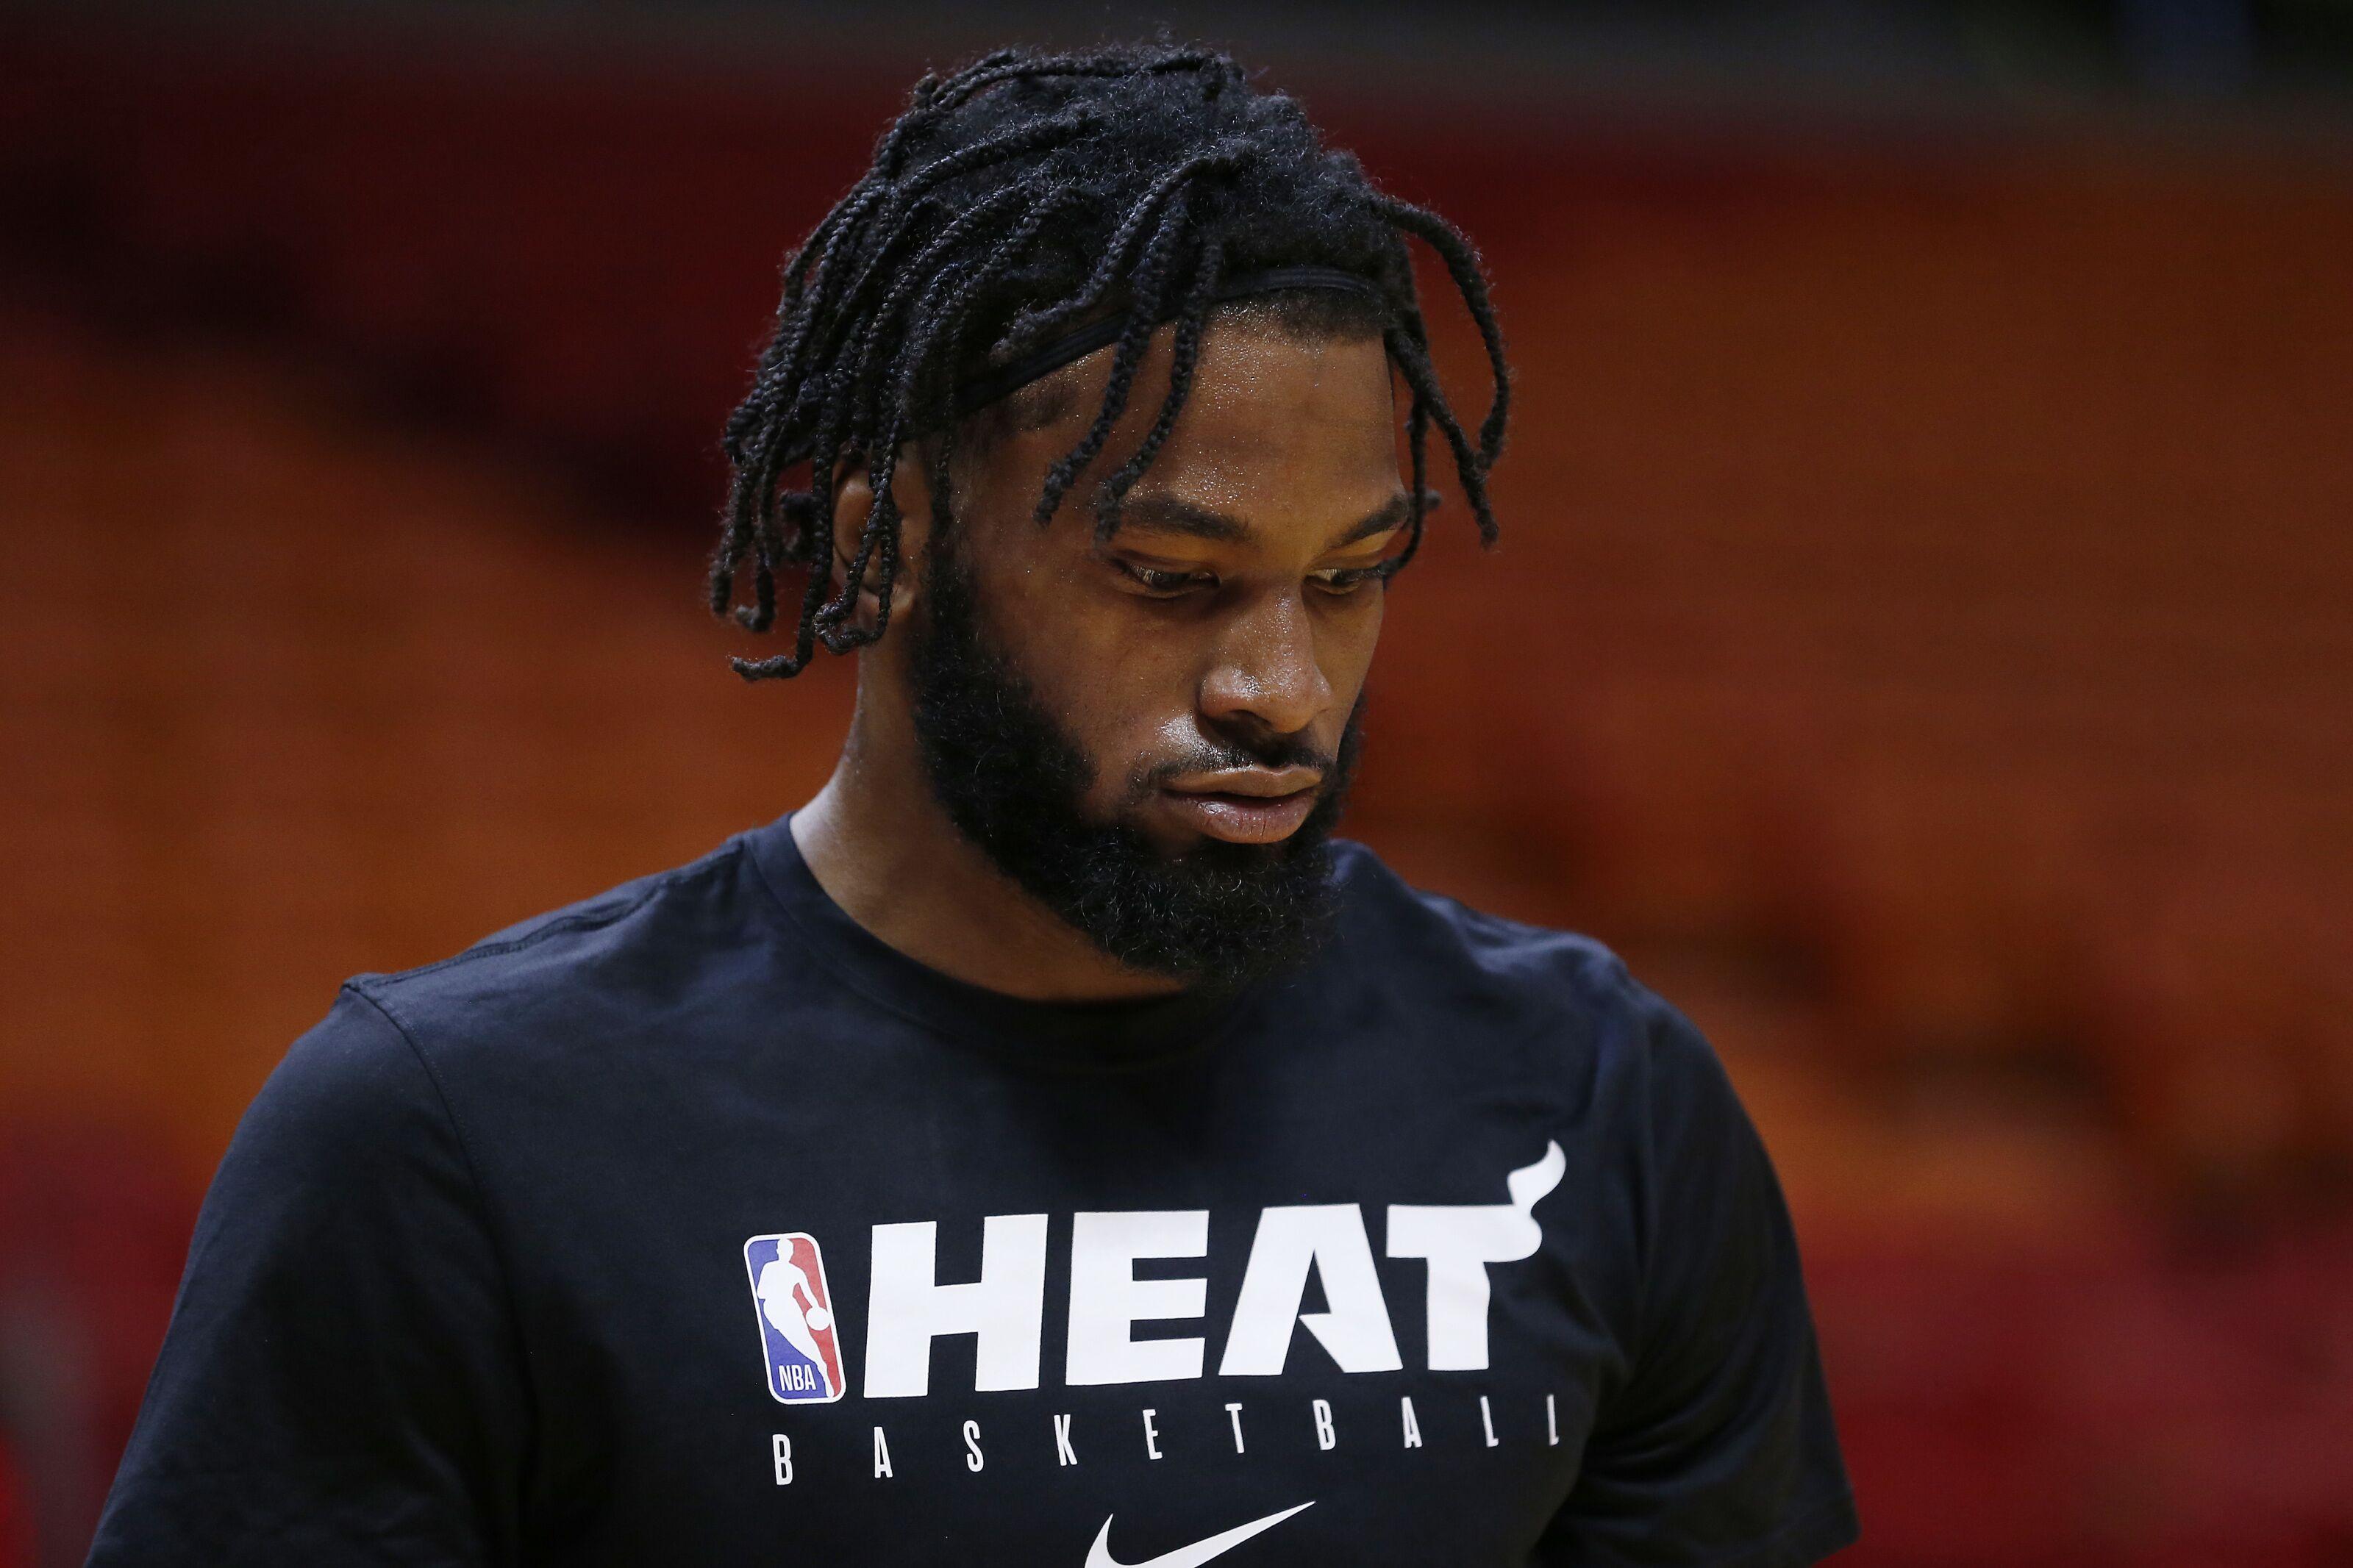 NBA Trade Deadline 2020: 5 trades to make the Miami Heat a contender